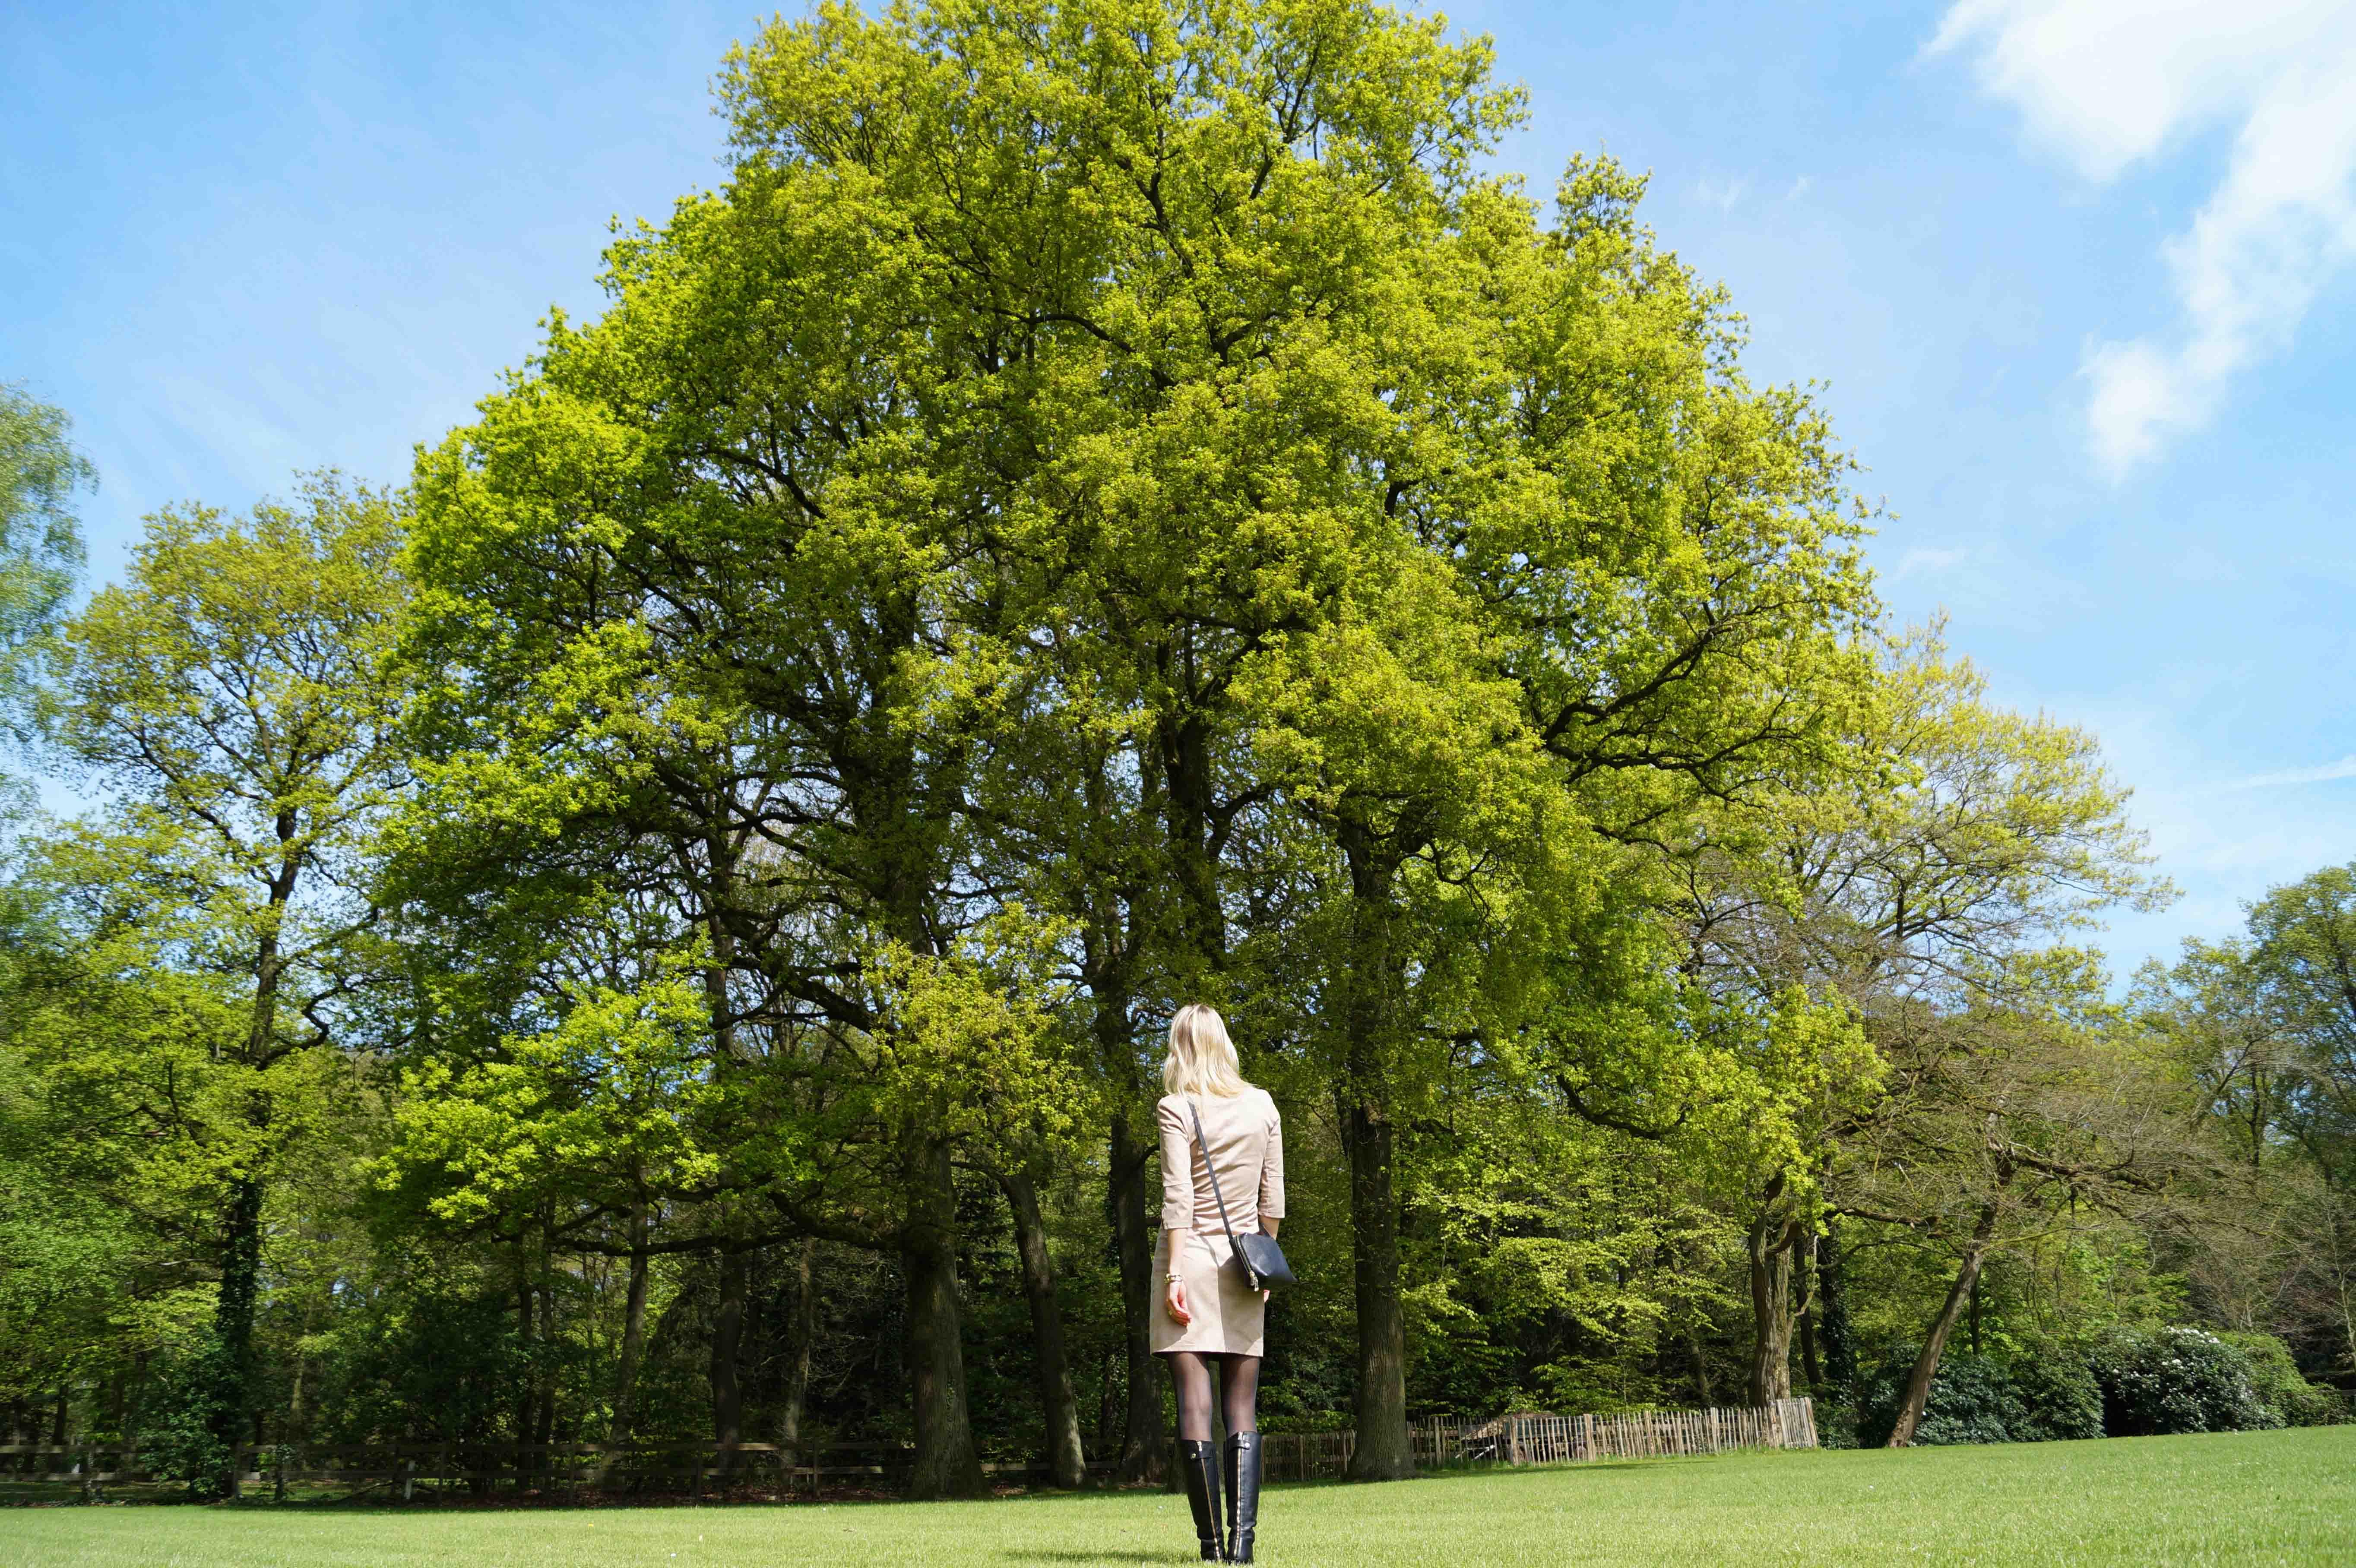 Bag at You - Fashion Blog - MYOMY leather bag - Spring dress and black boots - Zwarte tas en laarzen en lente oufit - big tree